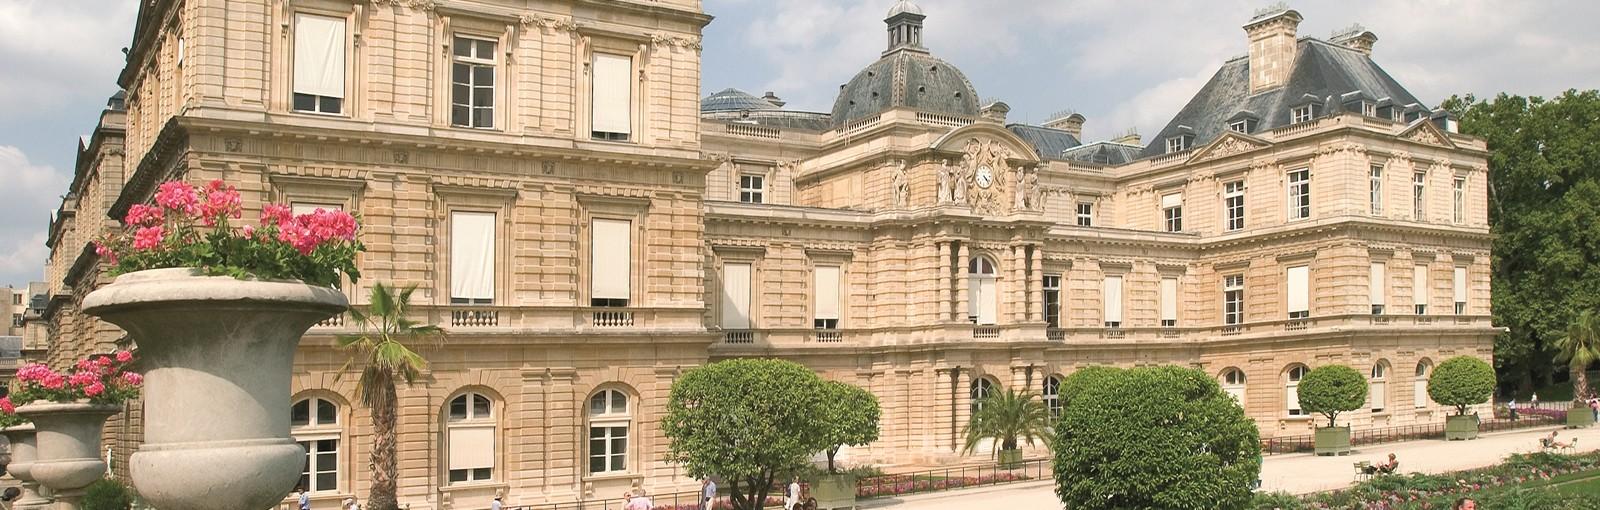 Tours 拉丁区,先贤祠,圣斯德望堂,卢森堡宫 - 徒步游 - 巴黎游